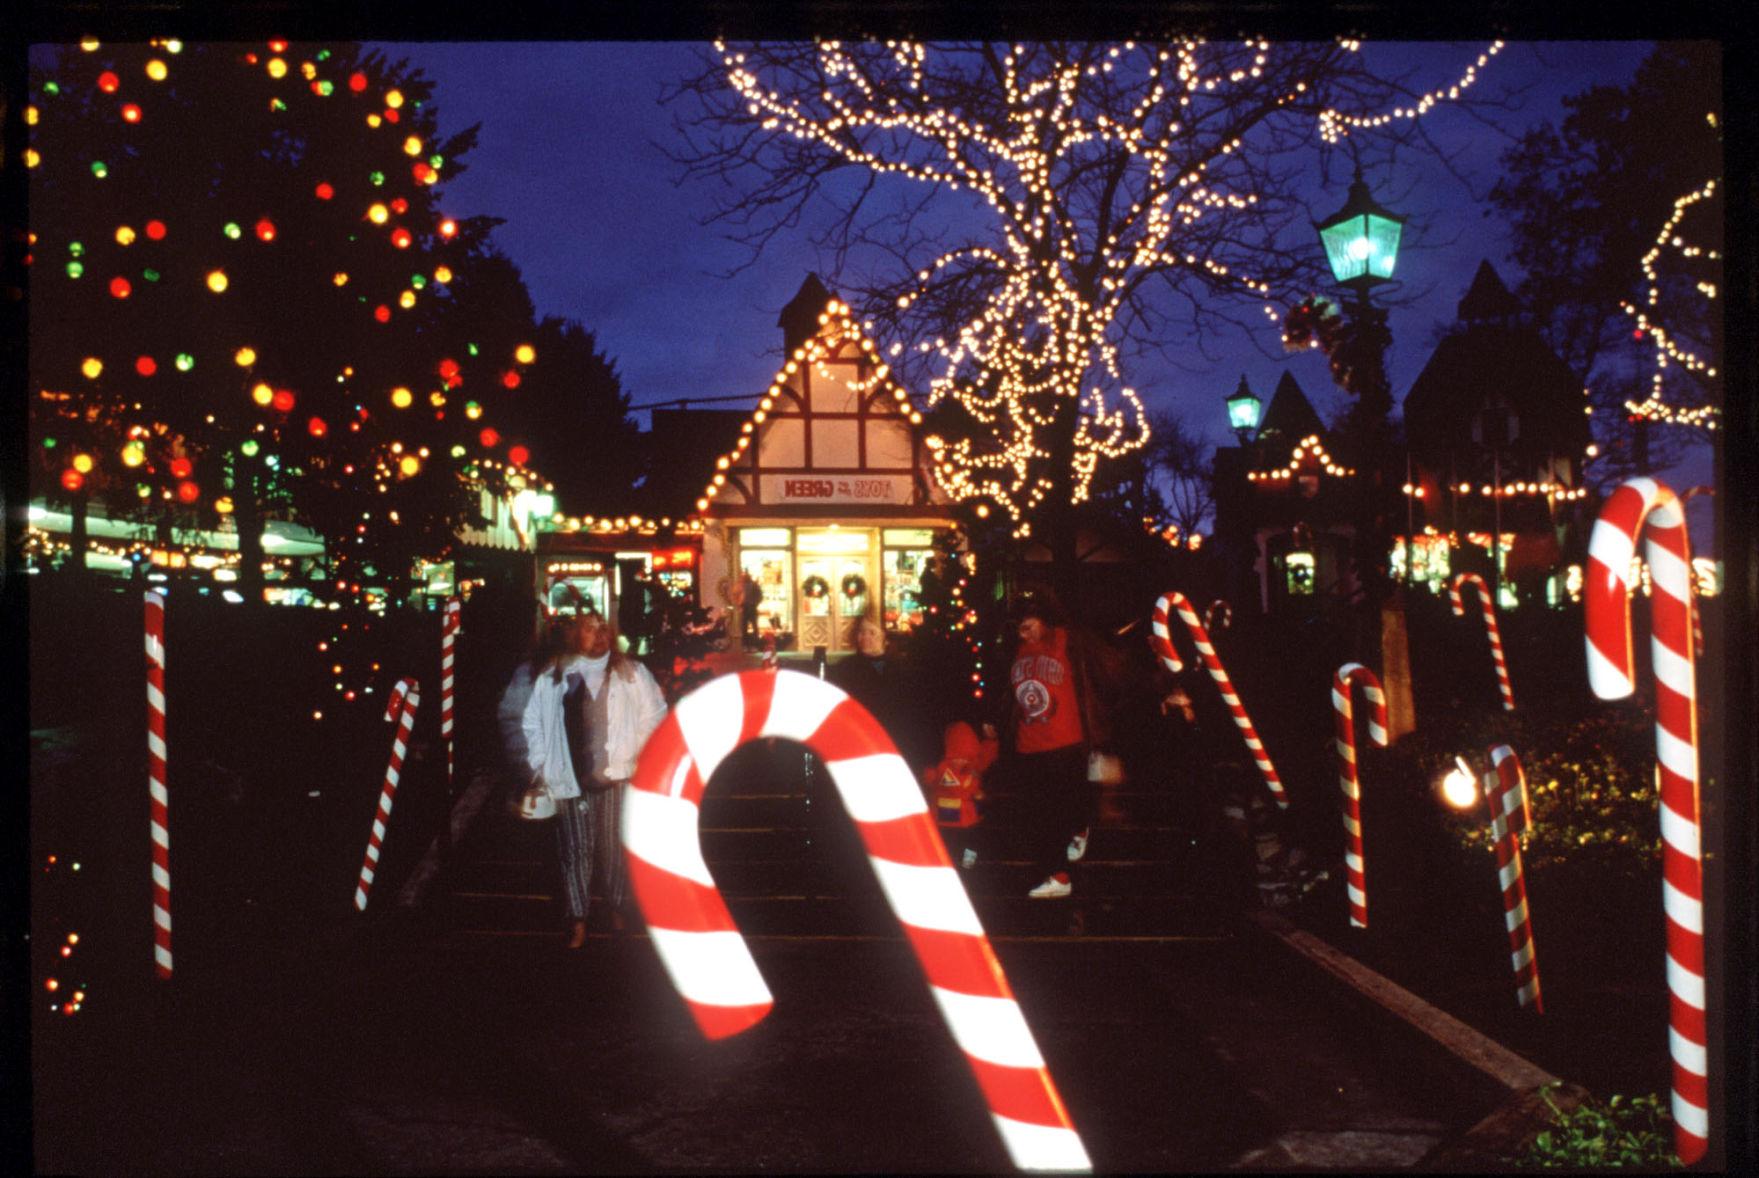 Lights, rides and holiday cheer at Hersheypark's Christmas ...